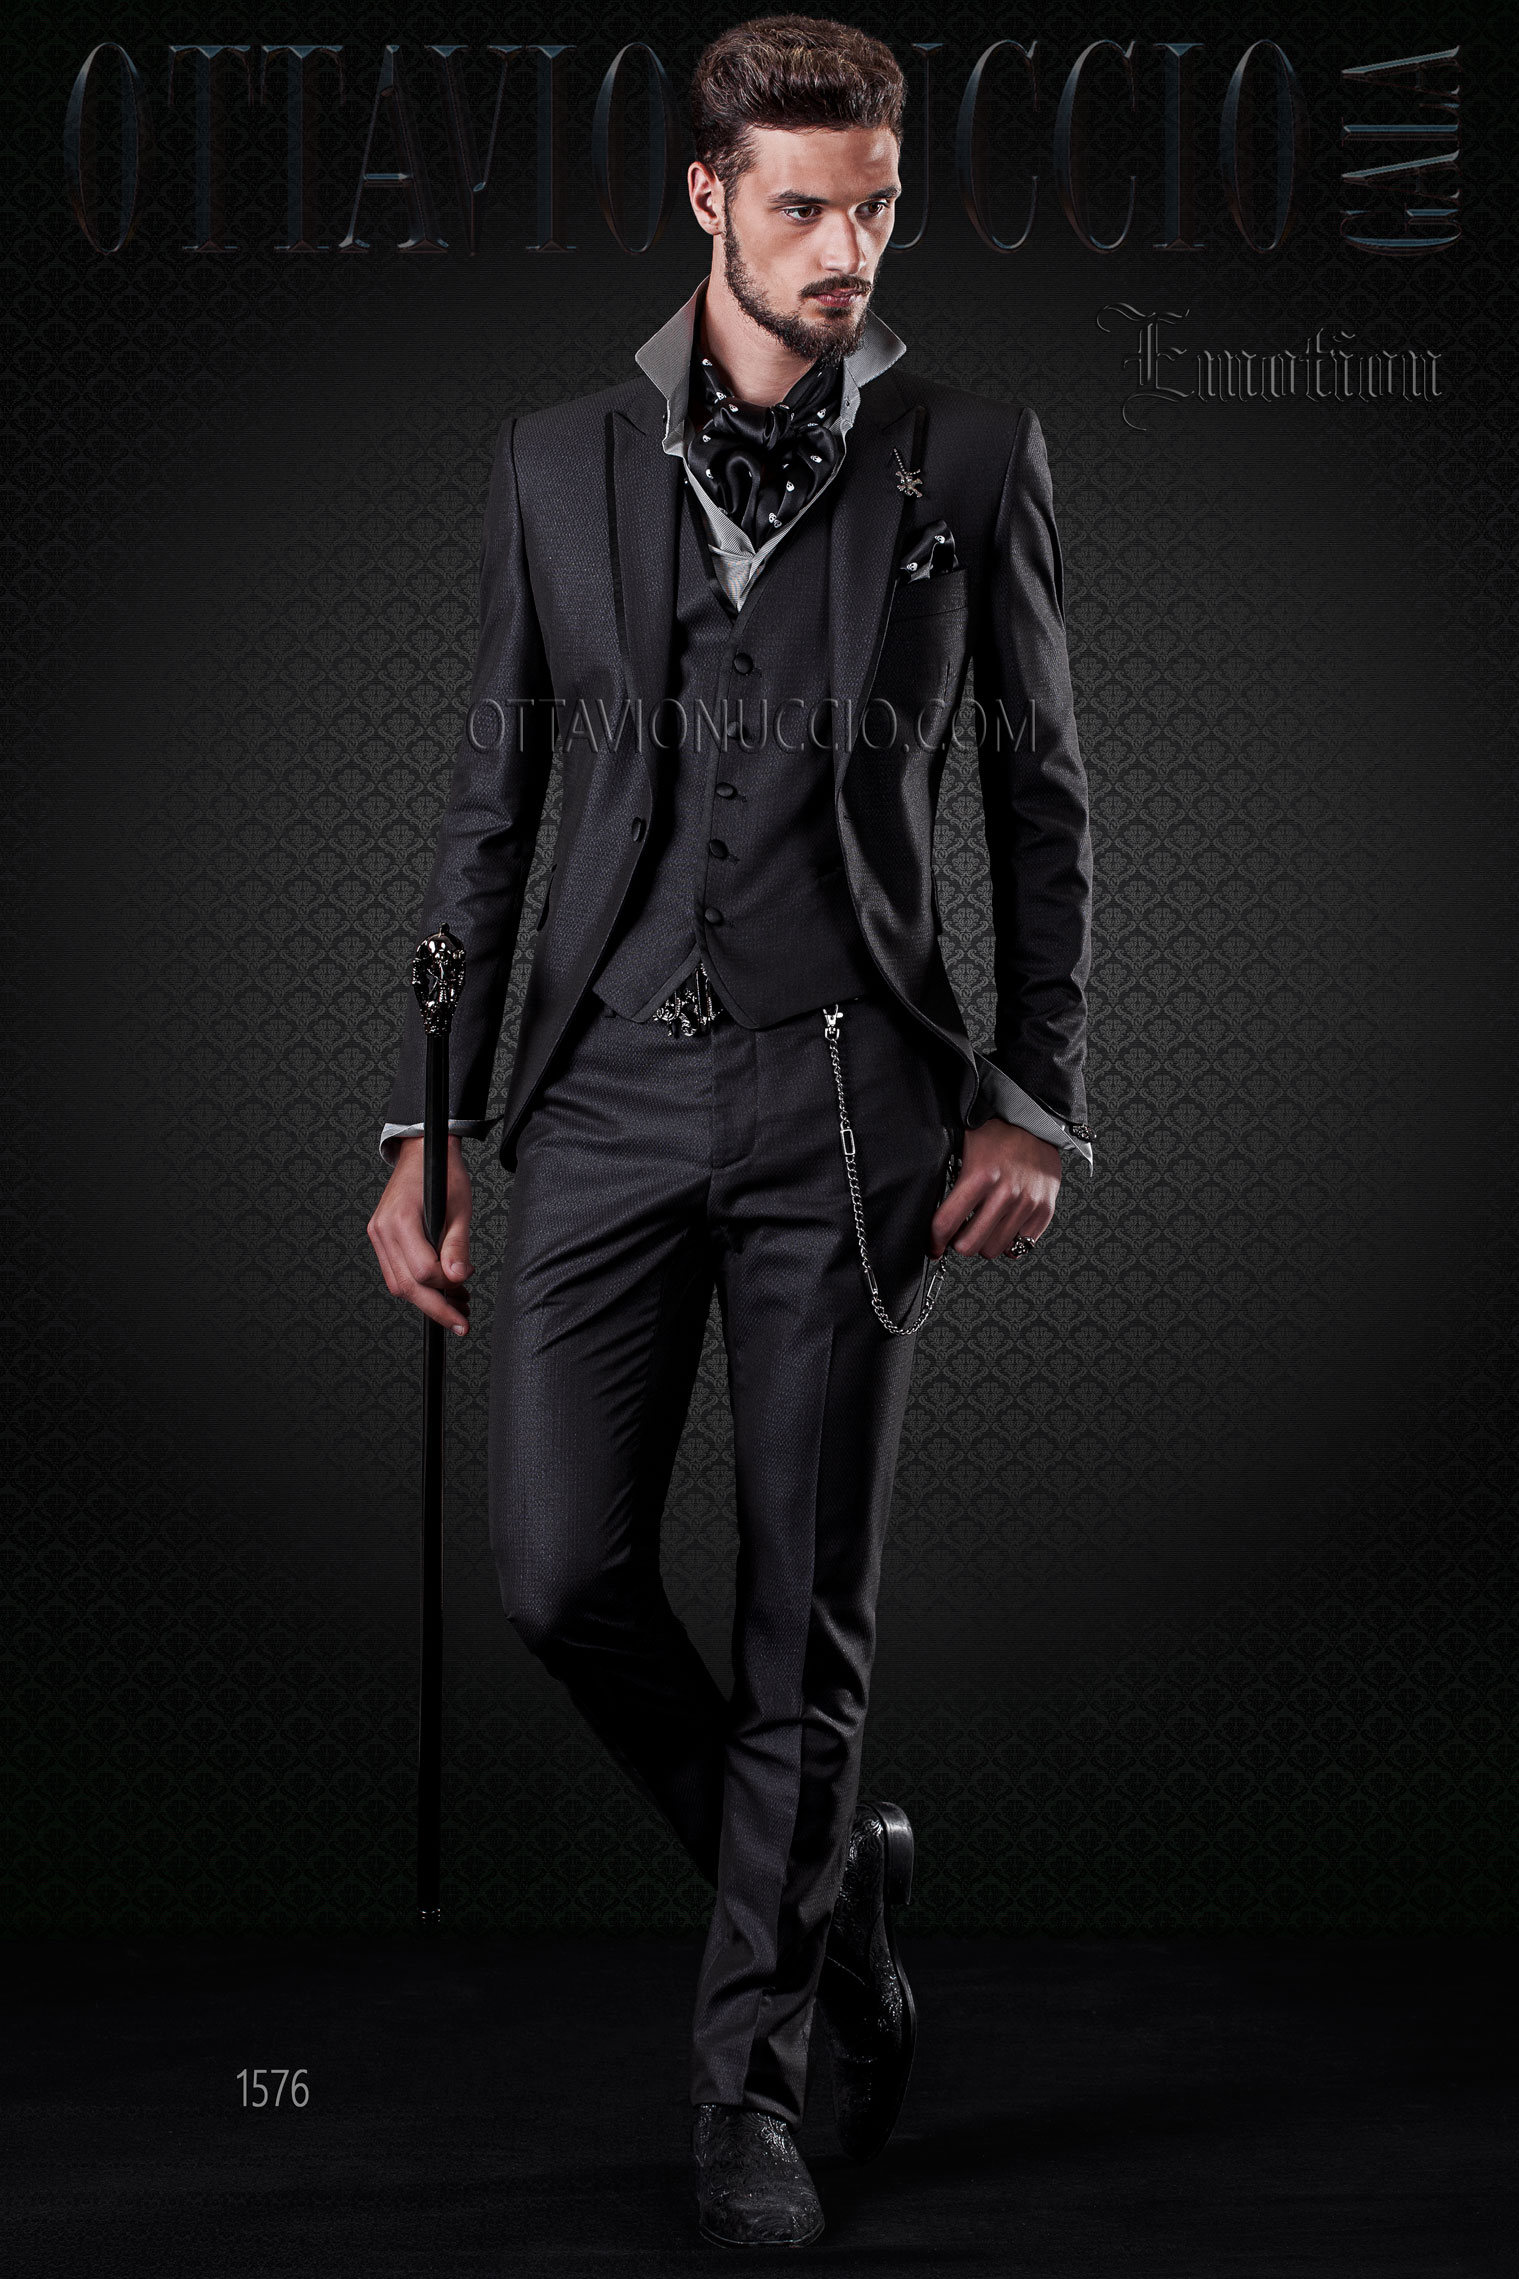 Vestito Matrimonio Uomo Nero : Abito matrimonio uomo nero con gilet a tono